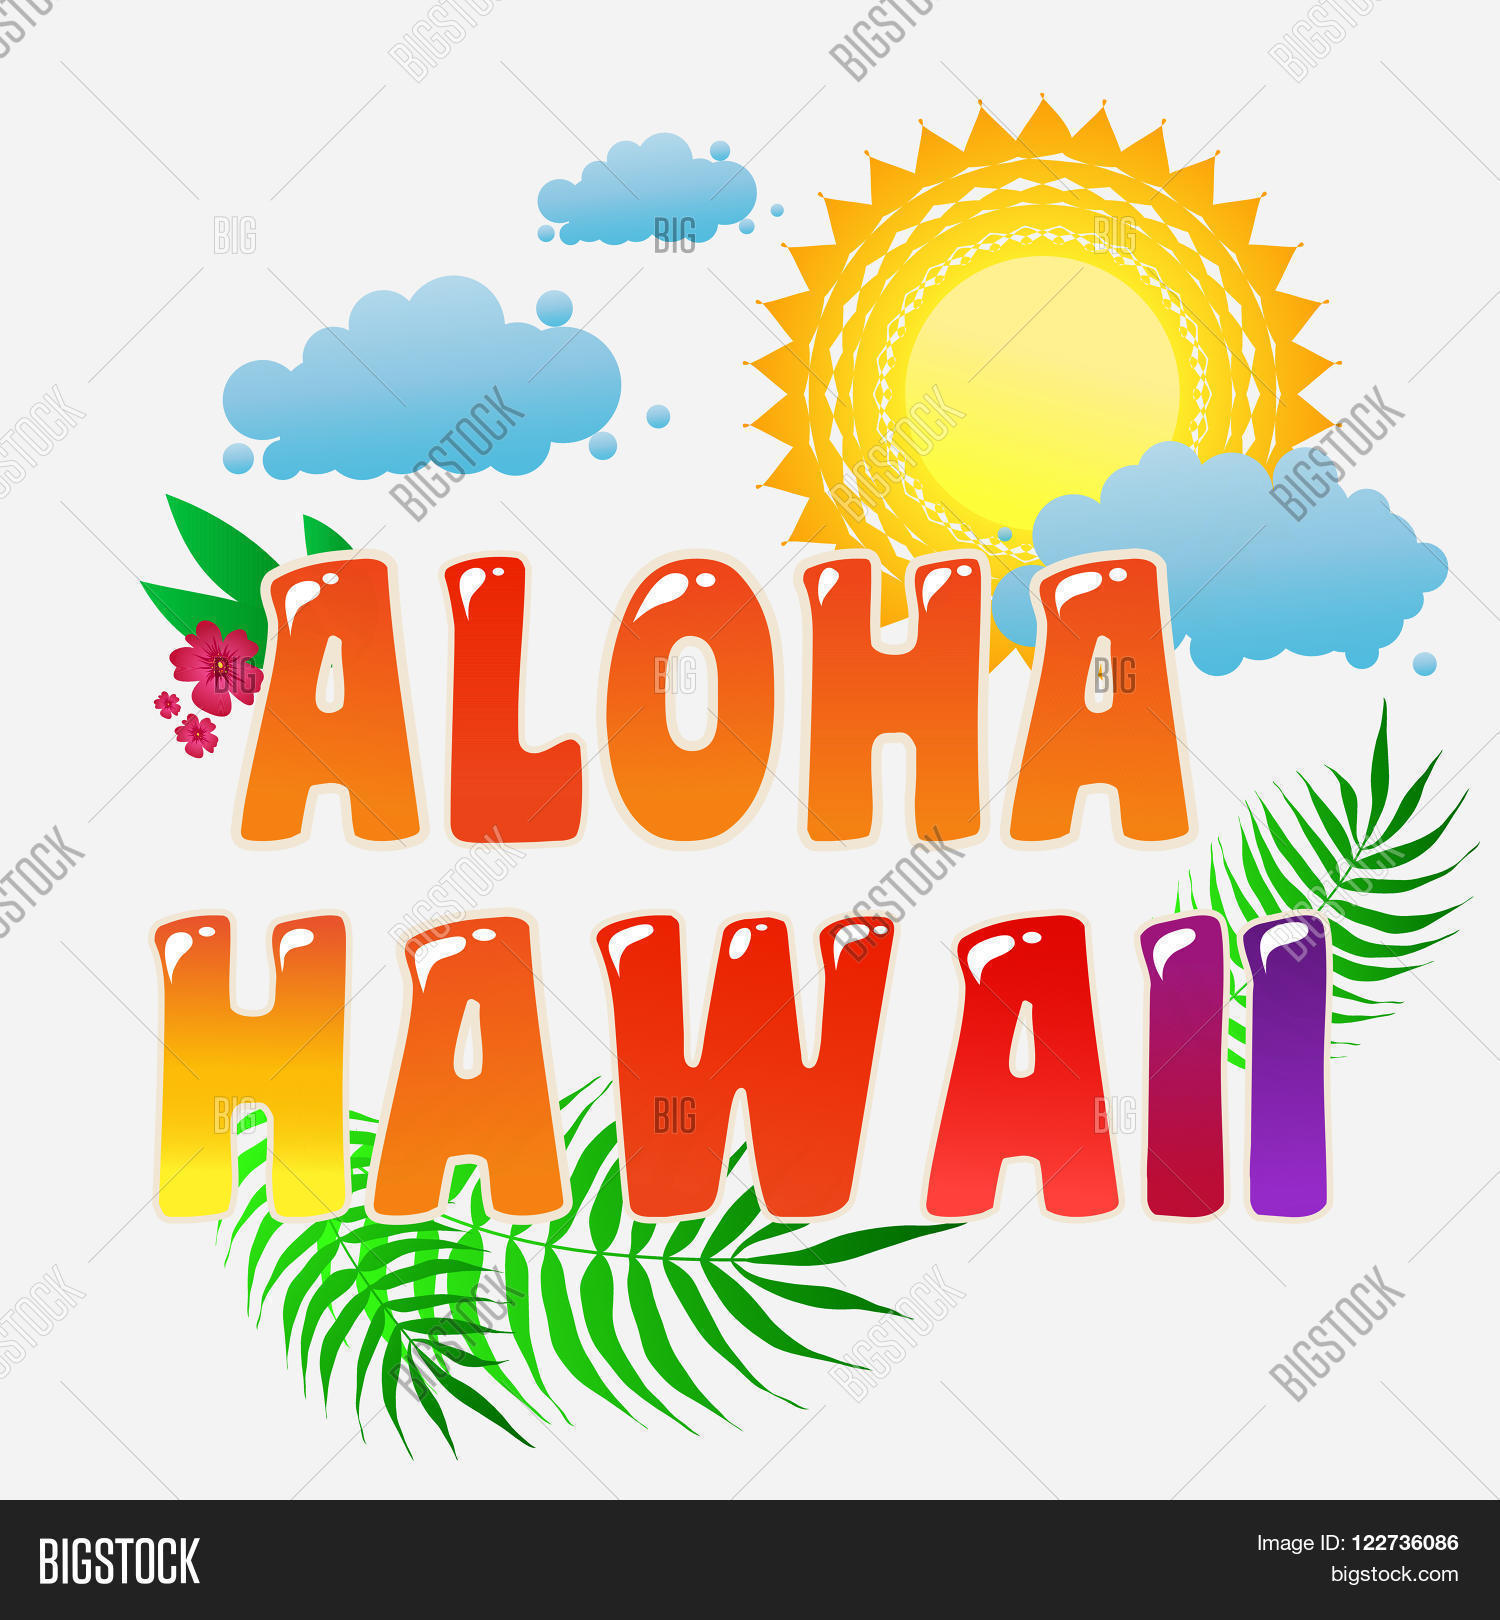 T shirt design hawaii - Aloha Hawaii Typography Art Summer Background Inspirational And Motivational Tropical Print For T